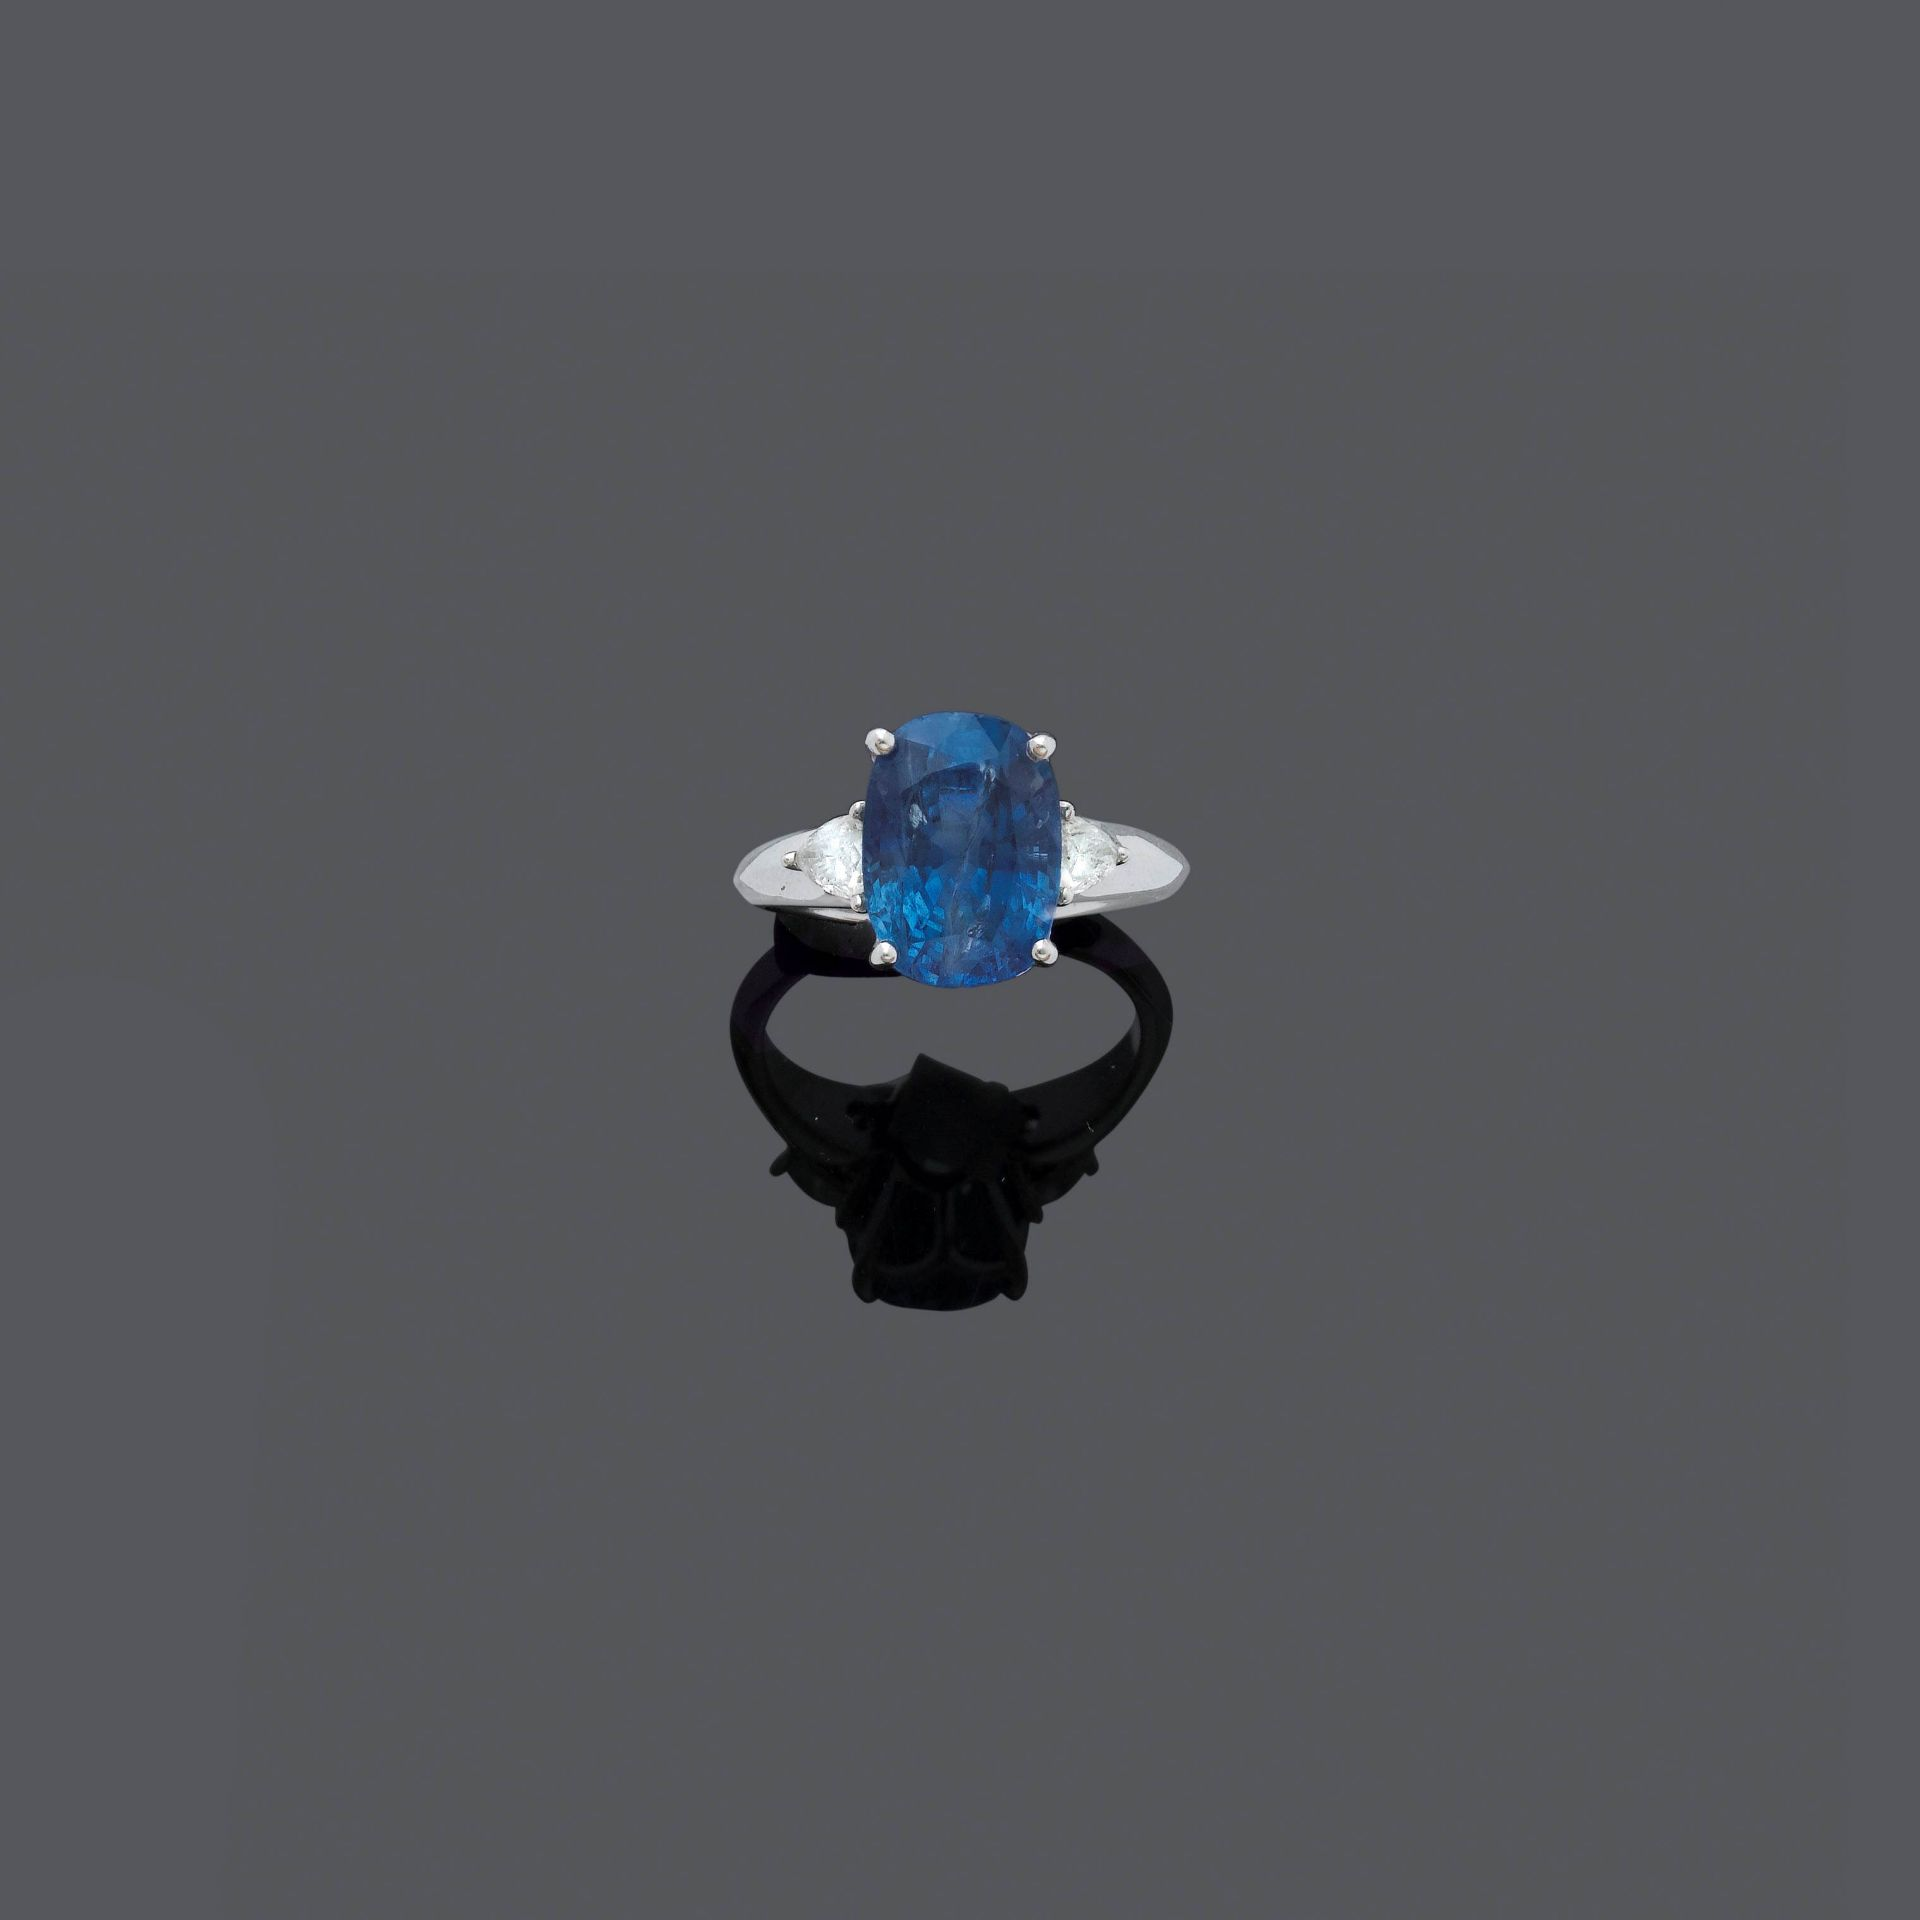 BURMA SAPPHIRE AND DIAMOND RING.